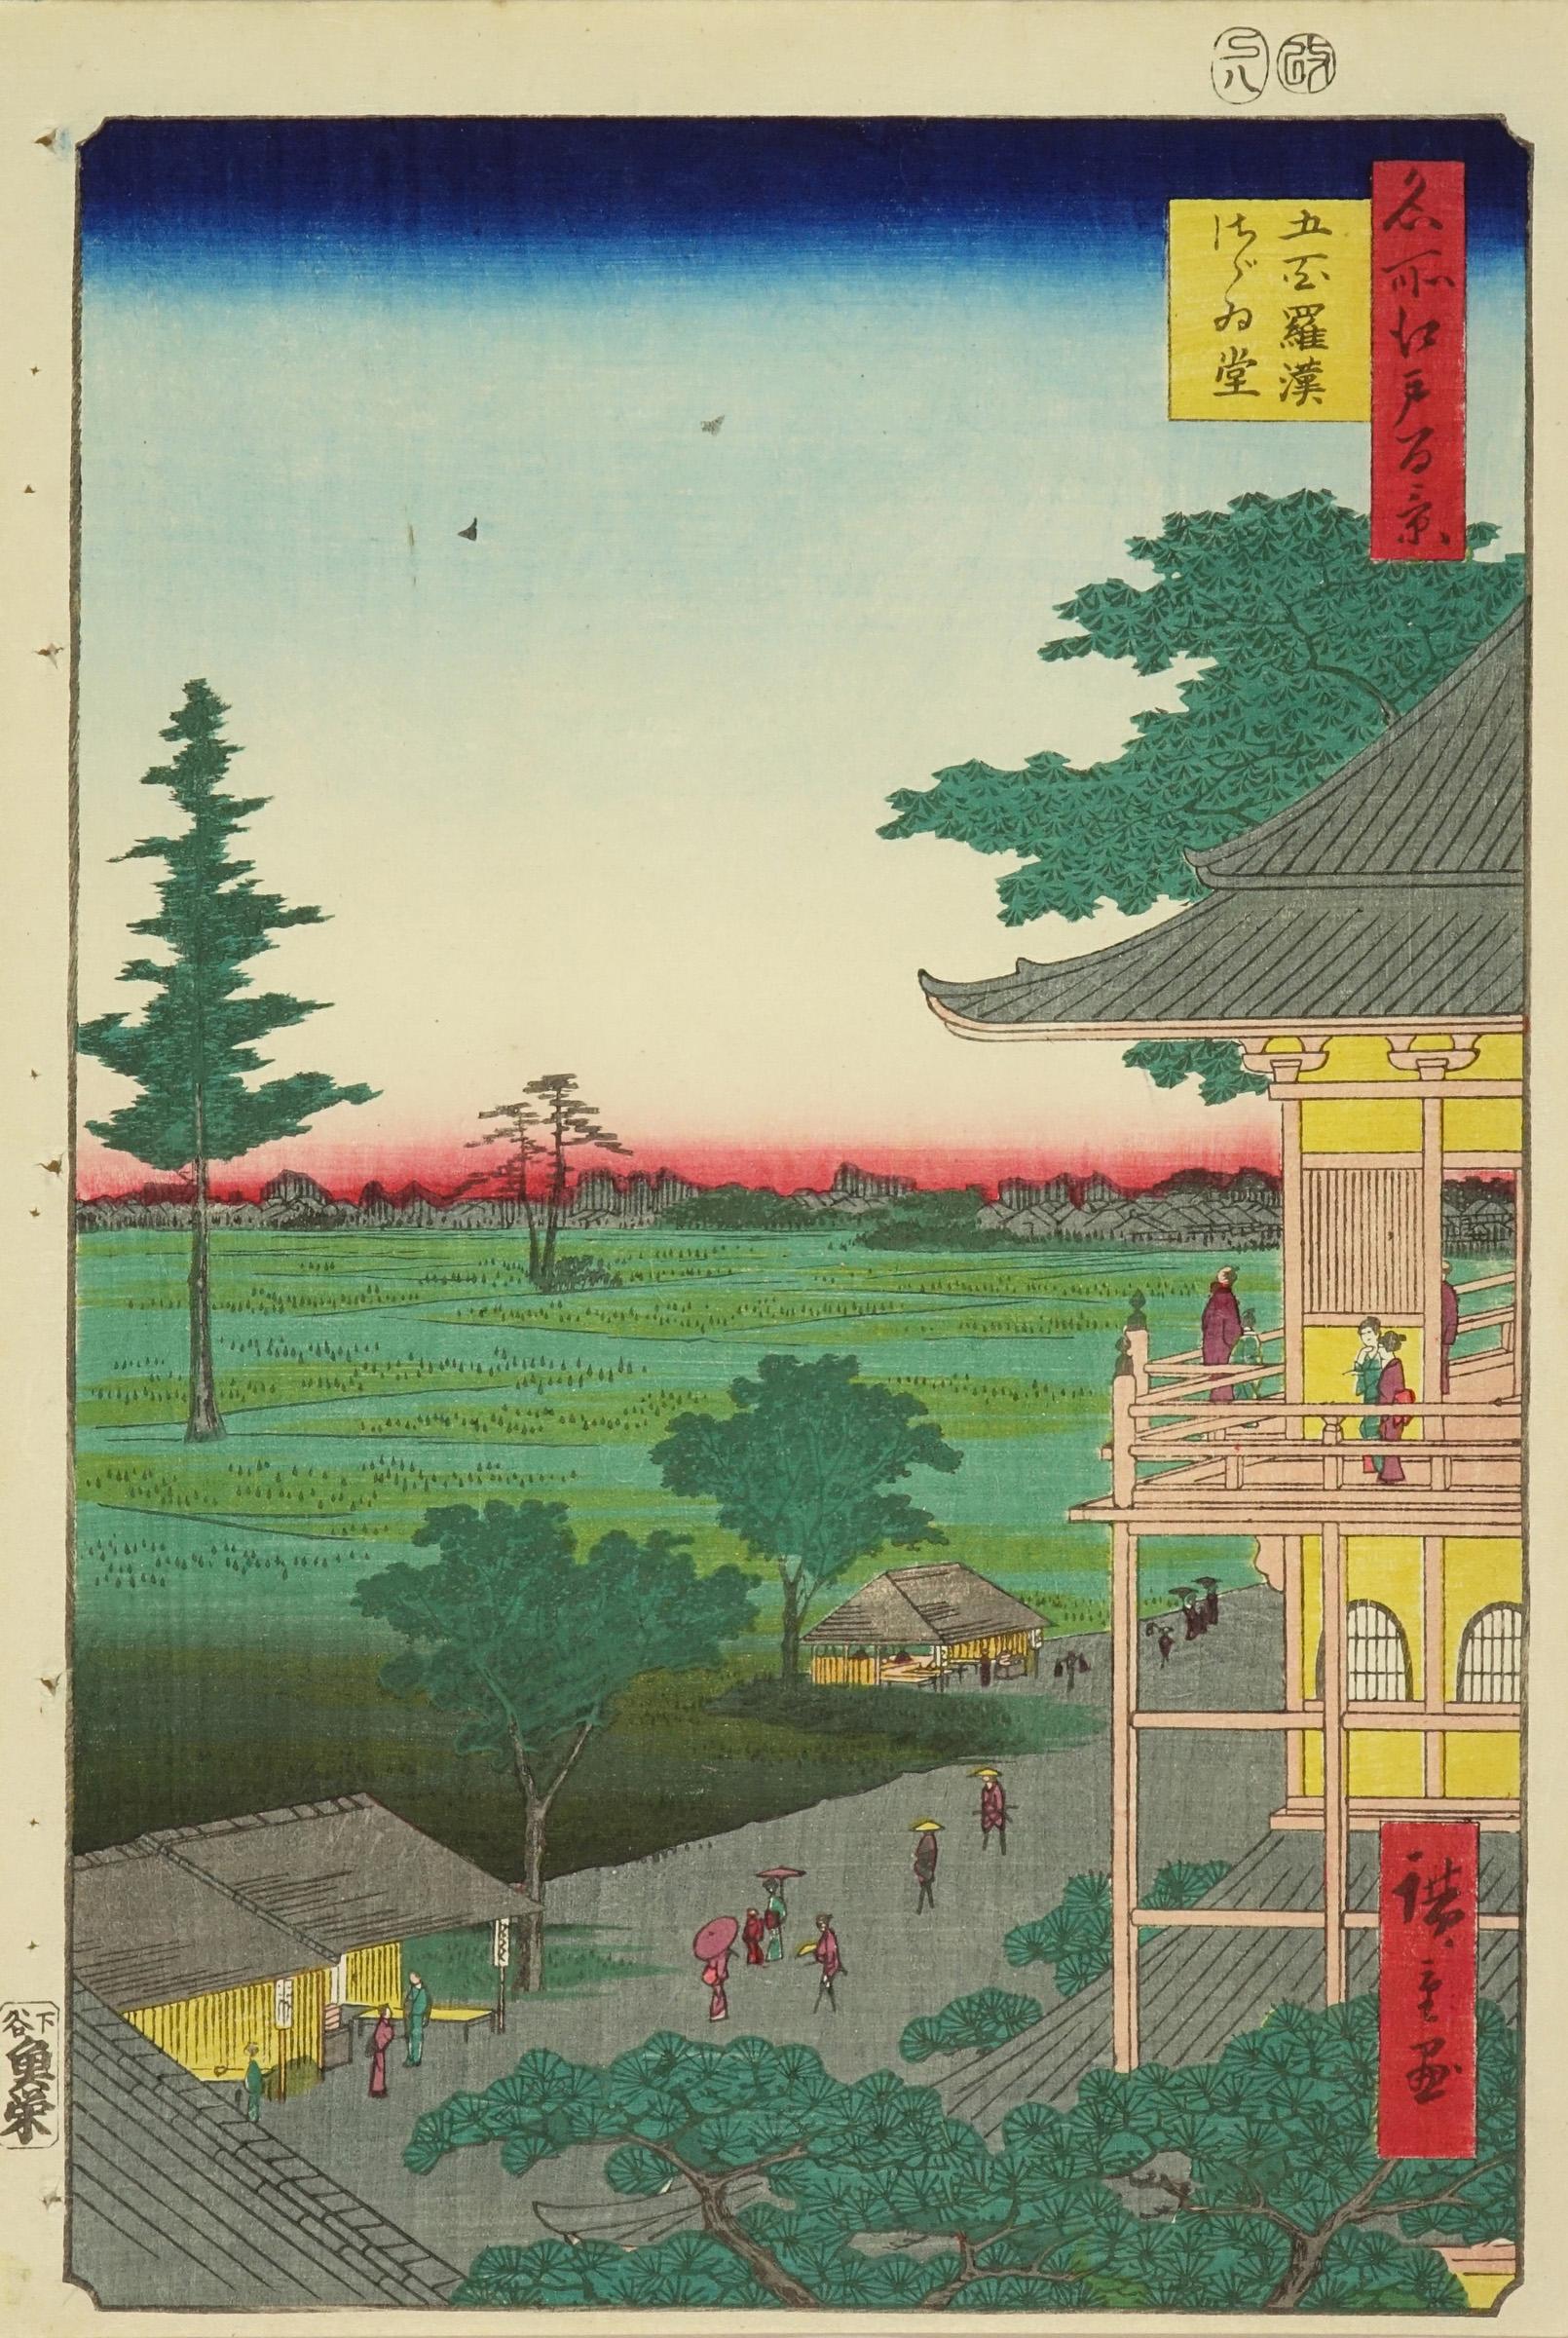 HIROSHIGE Gohyaku rakanji Sazaido (Sazai Hall, Gohyaku rakan Temple), from <i>Meisho Edo hyakkei</i> (One hundred views of famous places of Edo)